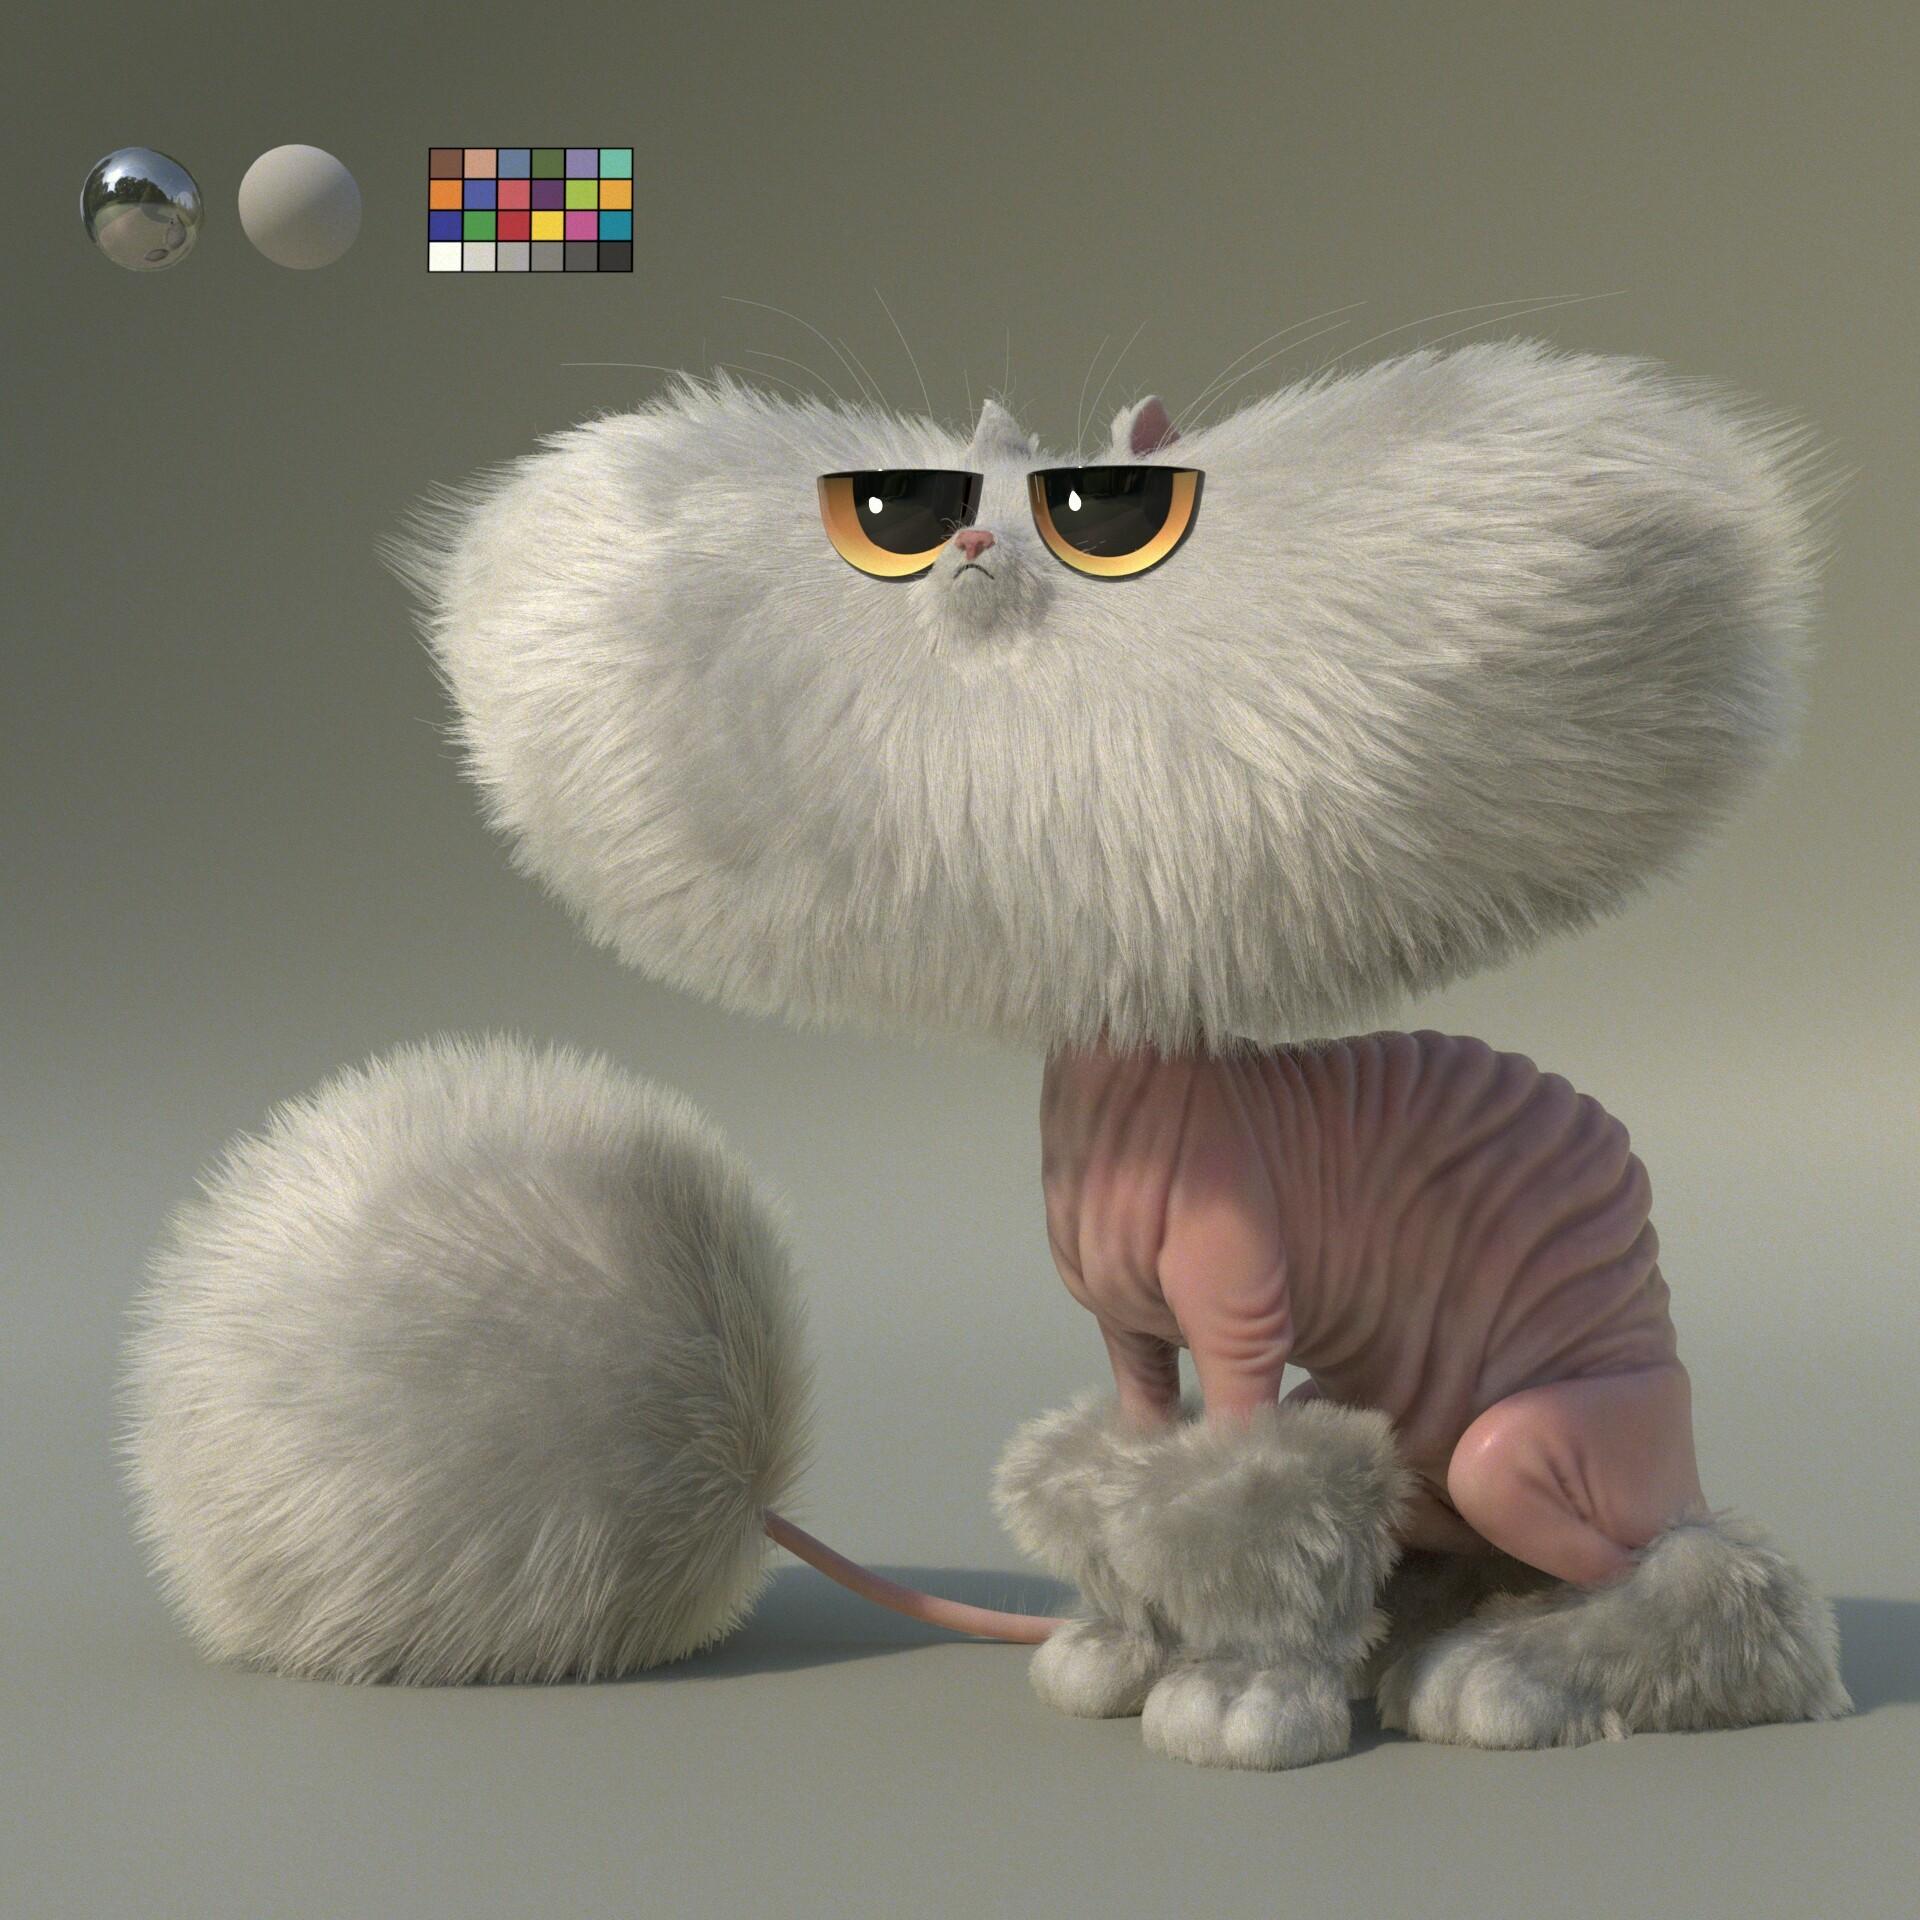 Crystal bretz cat 011